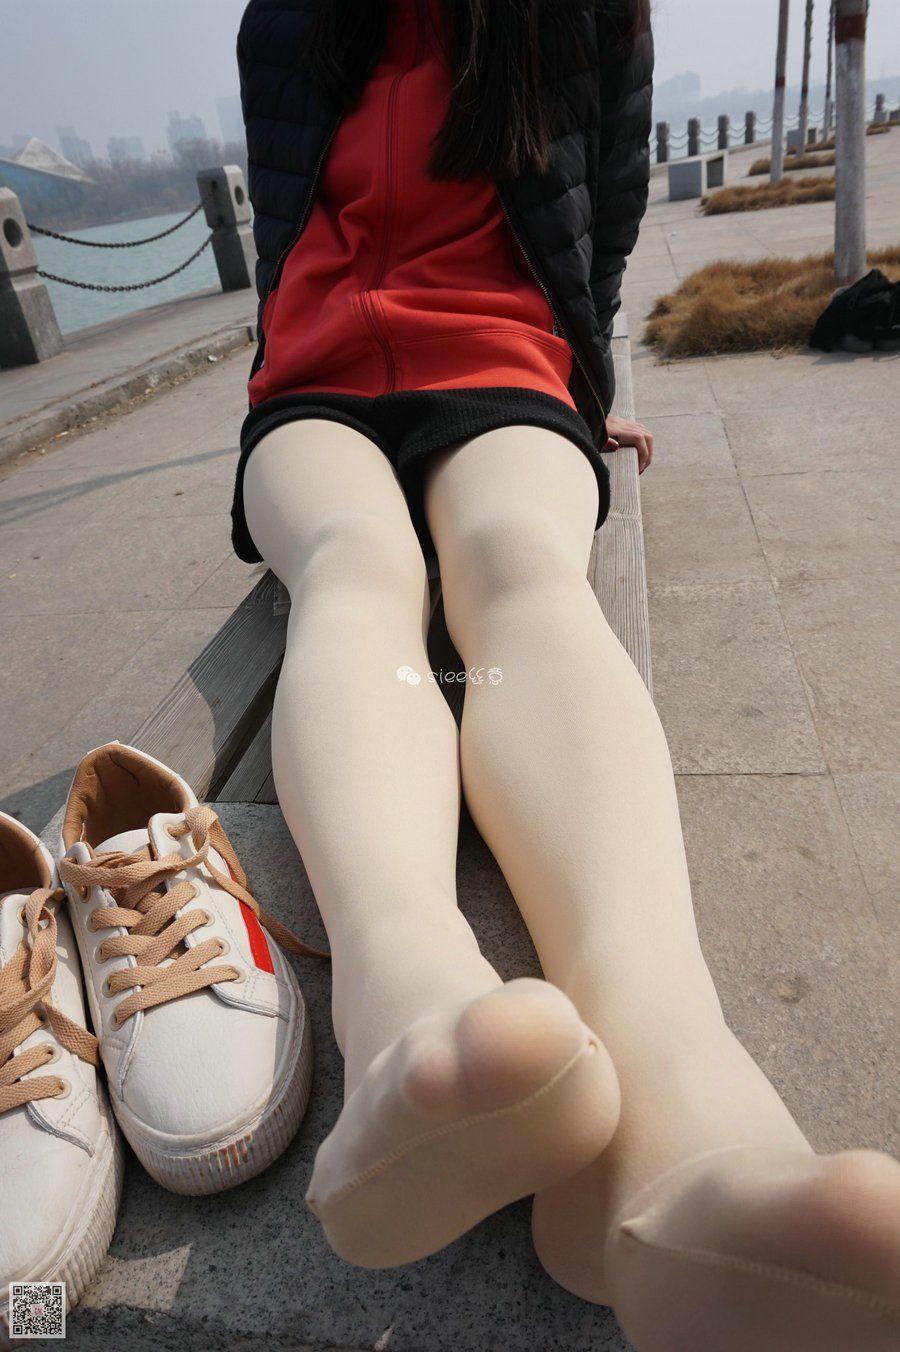 [SIEE丝意] No.062 琦琦 肉丝白鞋最配[78P/115M]